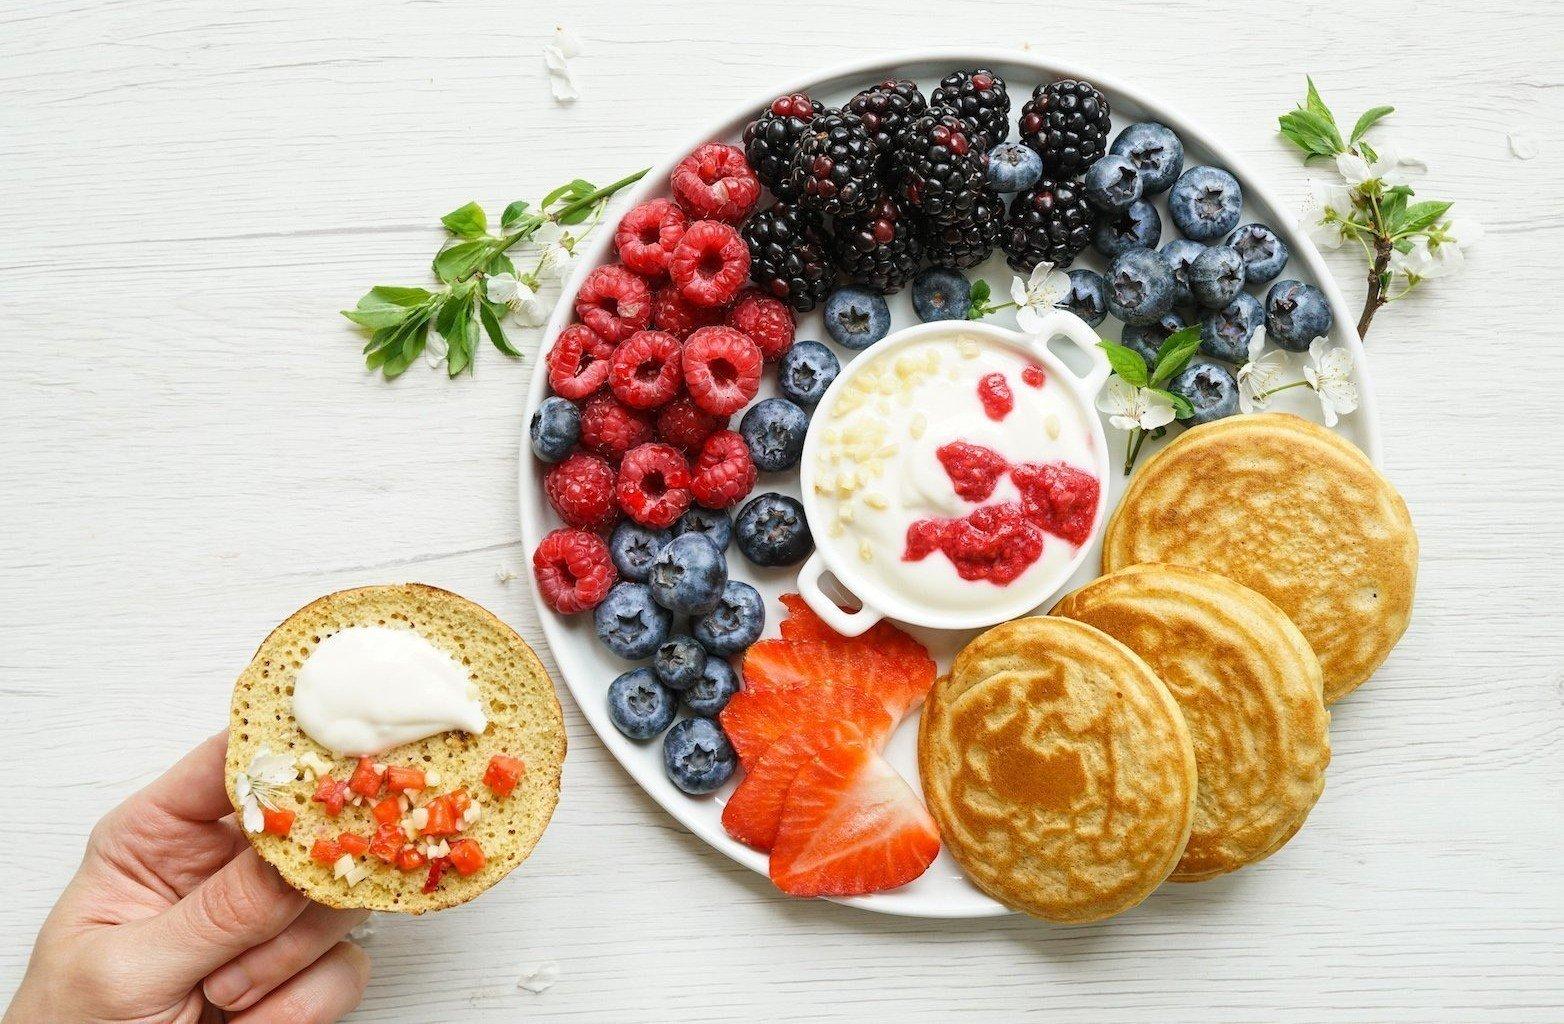 Easy Fluffy Paleo Pancakes (GF, DF, SF)